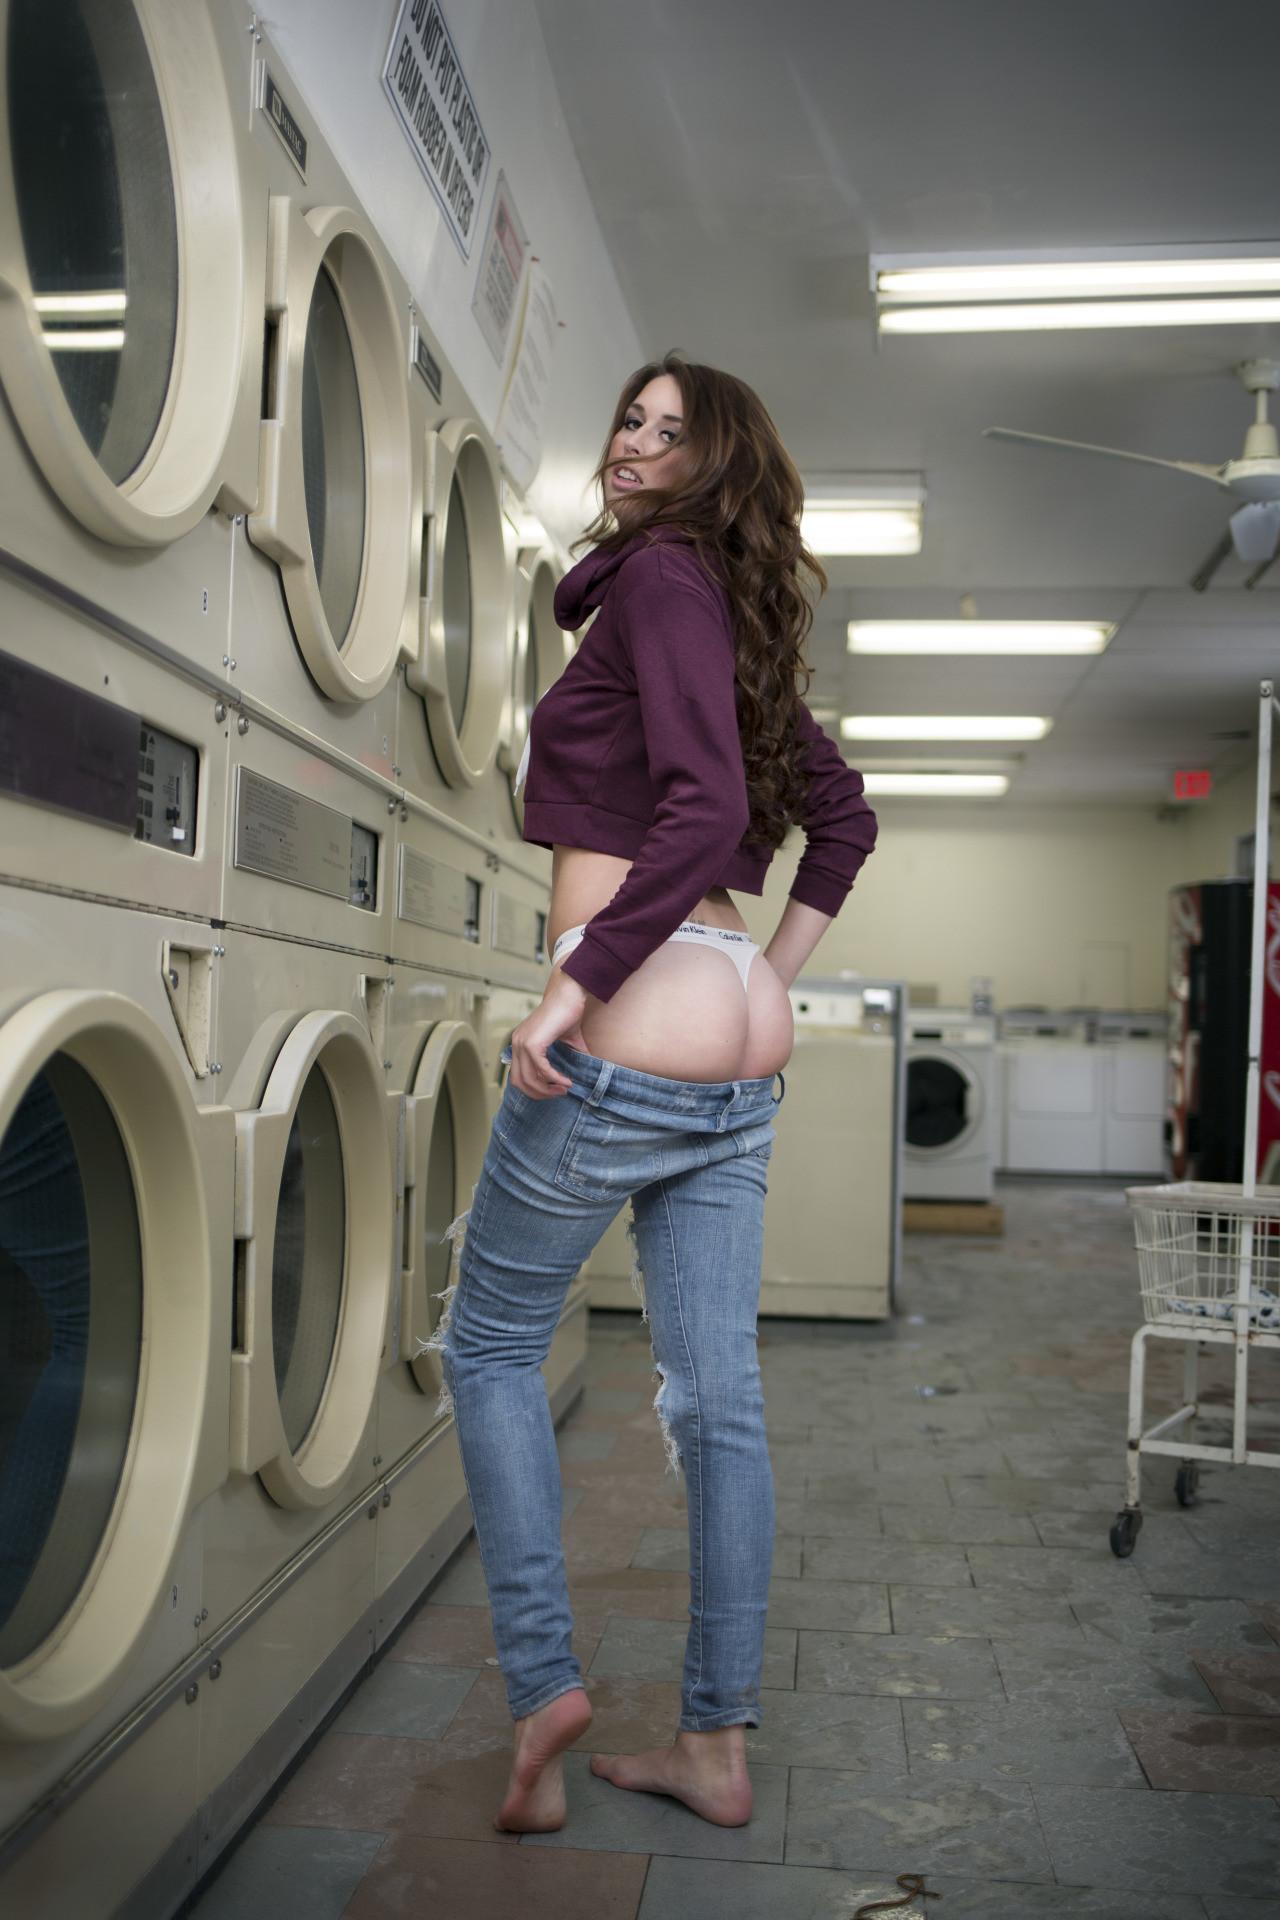 laundry-girls-nude-washing-machine-photo-mix-70